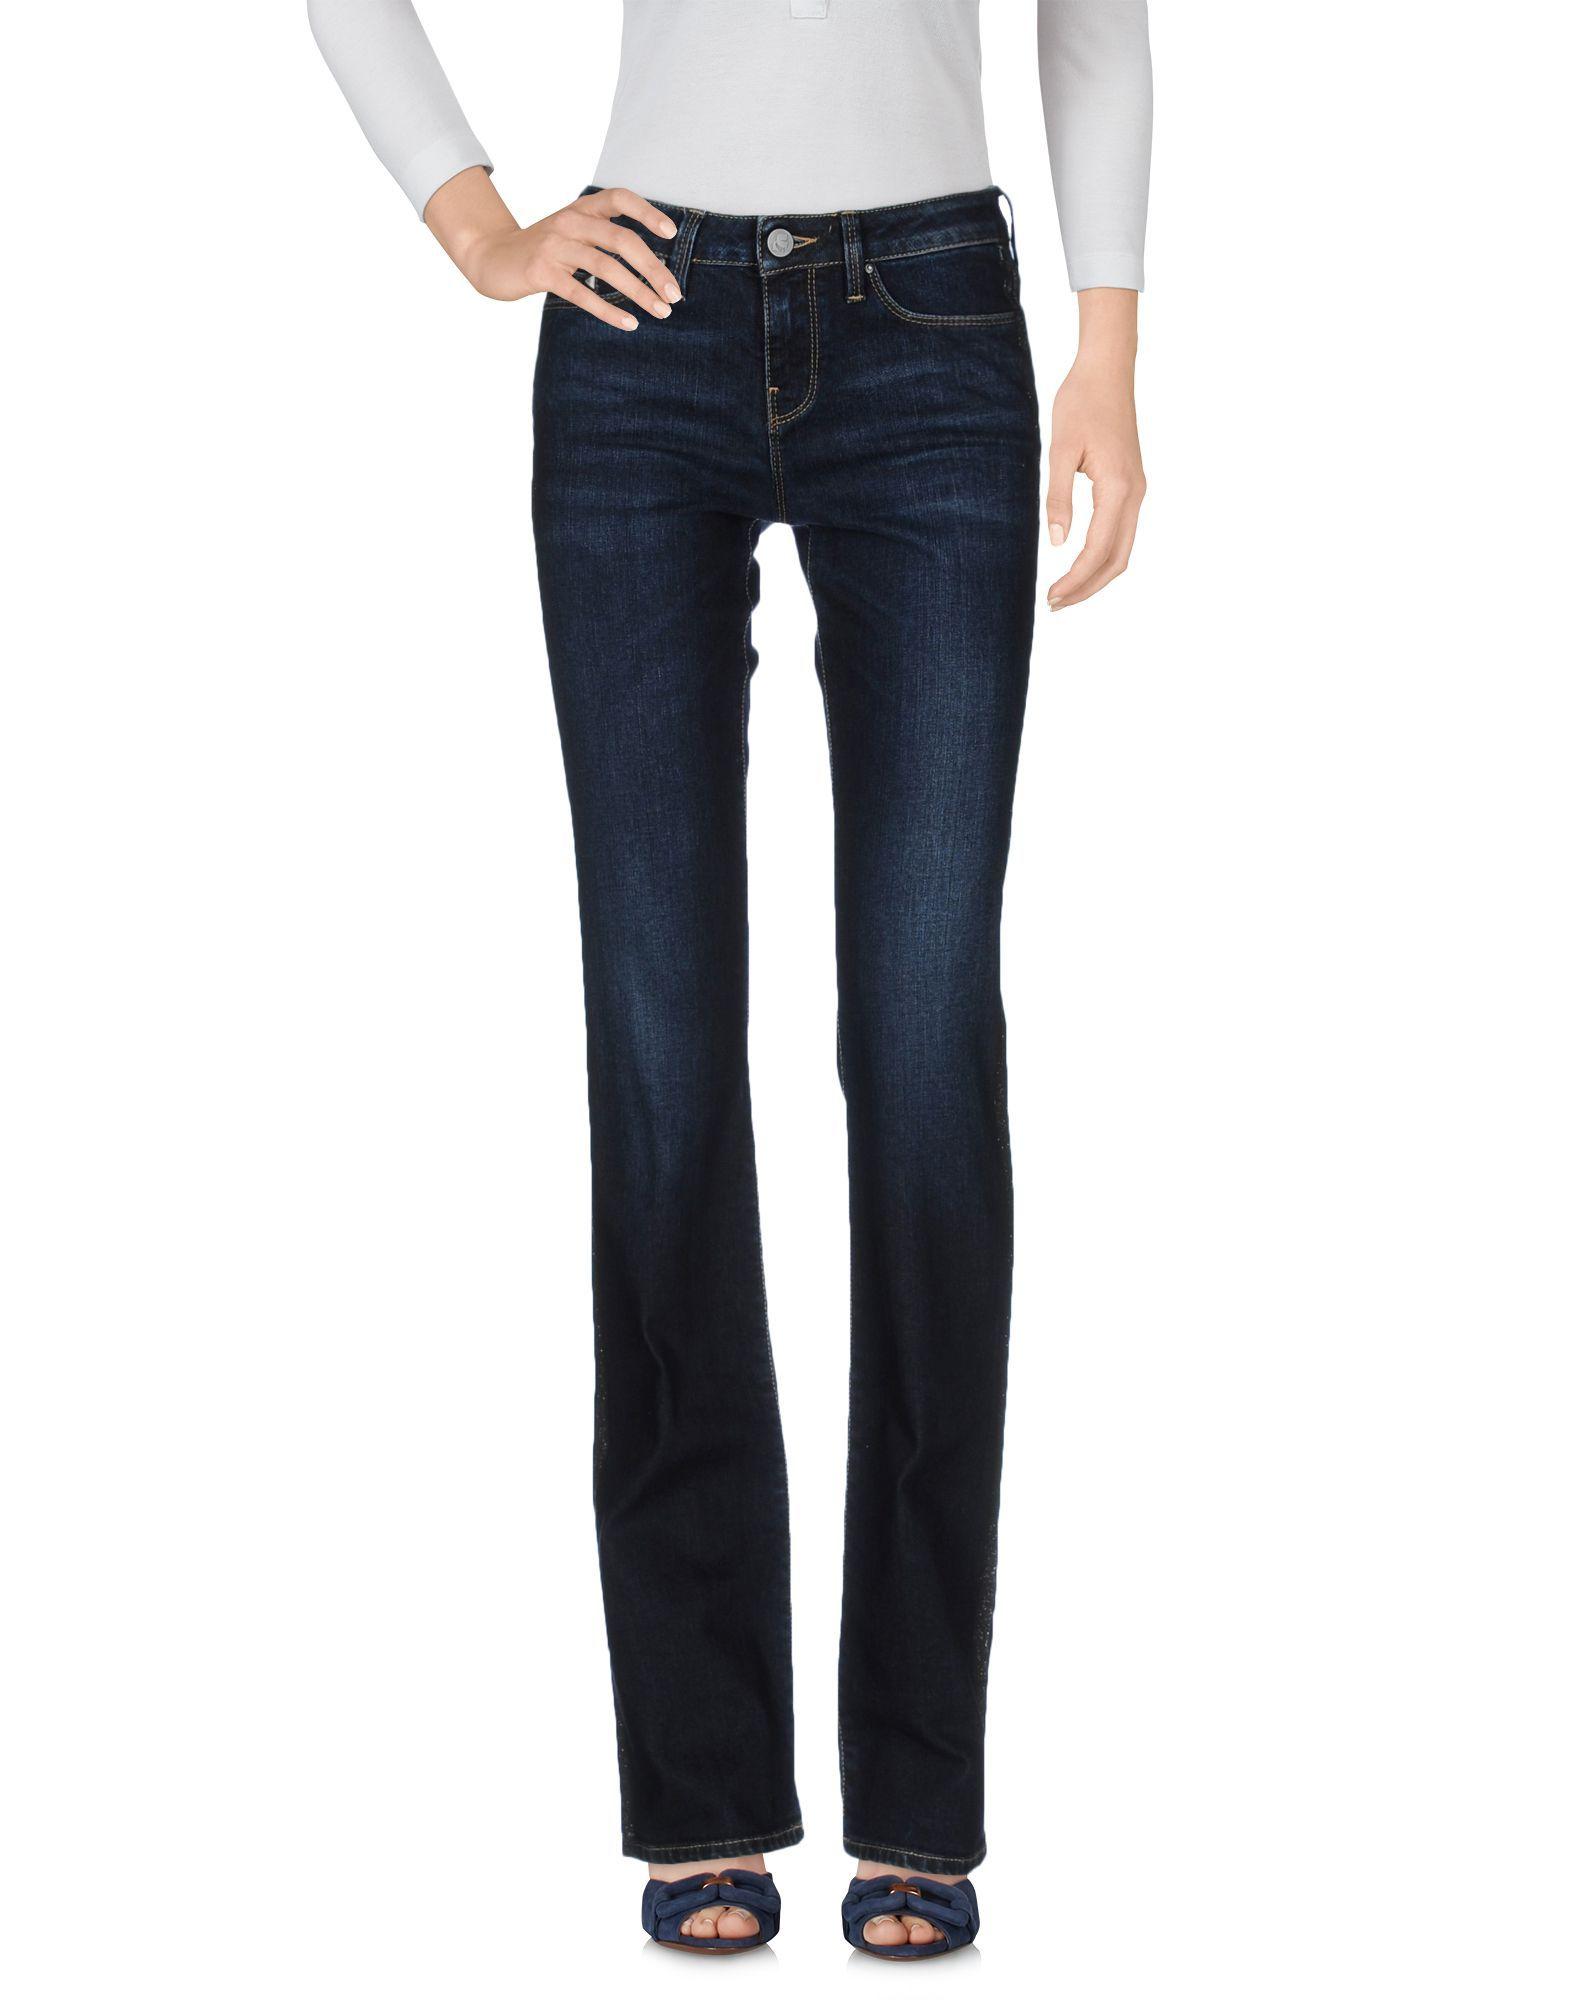 Karl Lagerfeld Blue Cotton Jeans